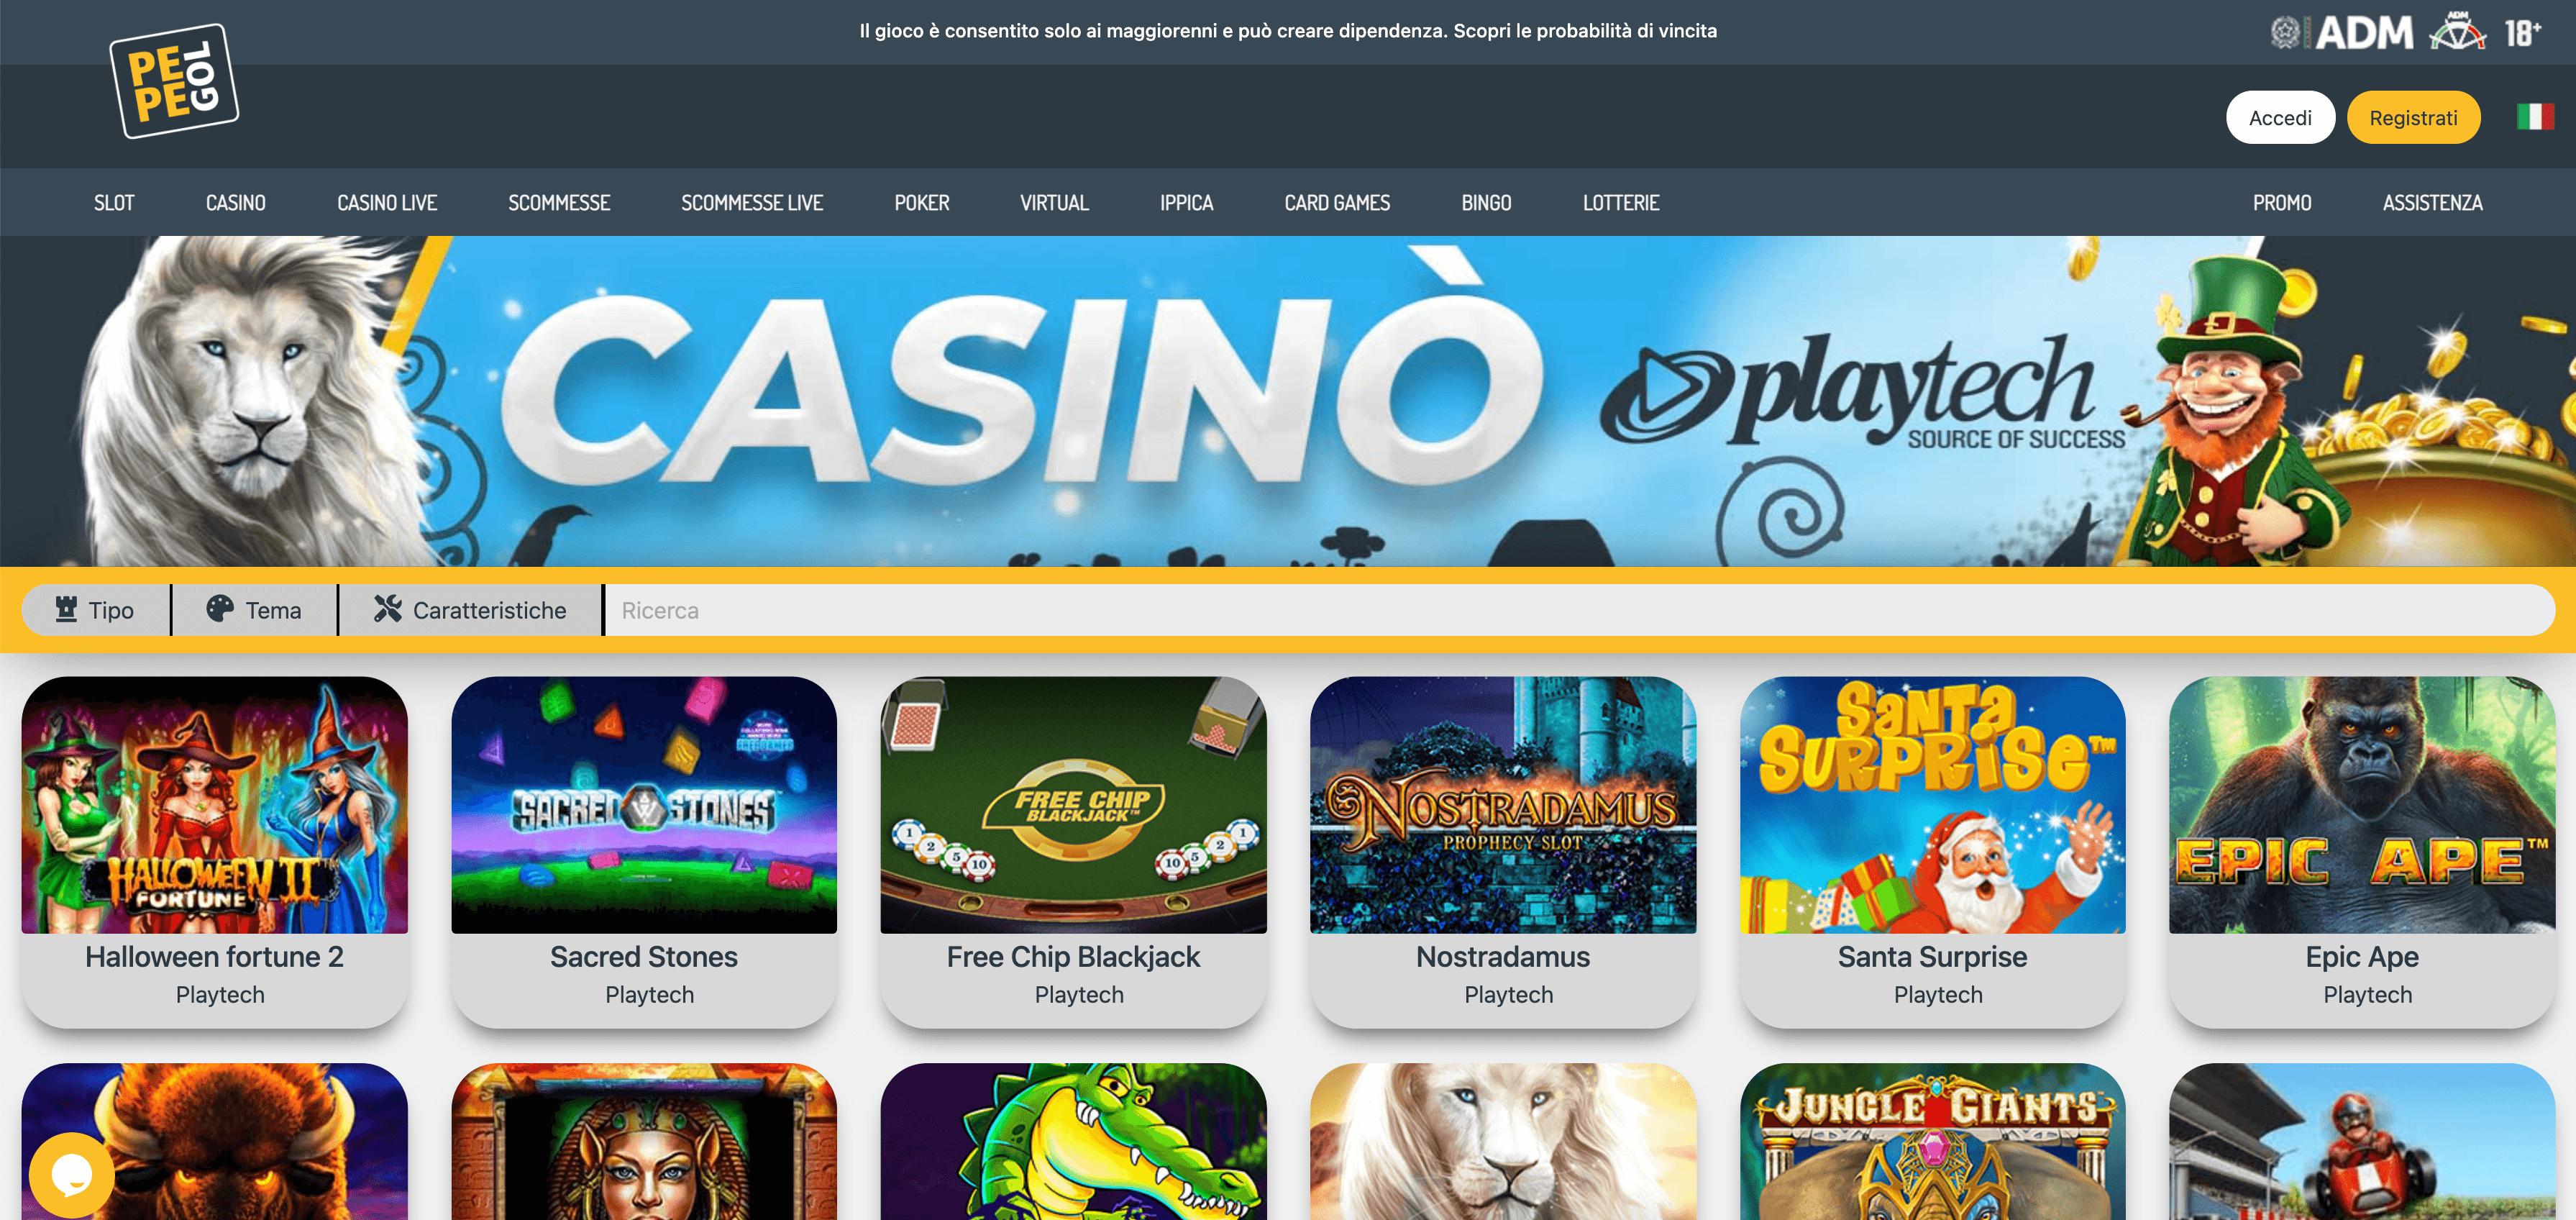 pepegol casino online